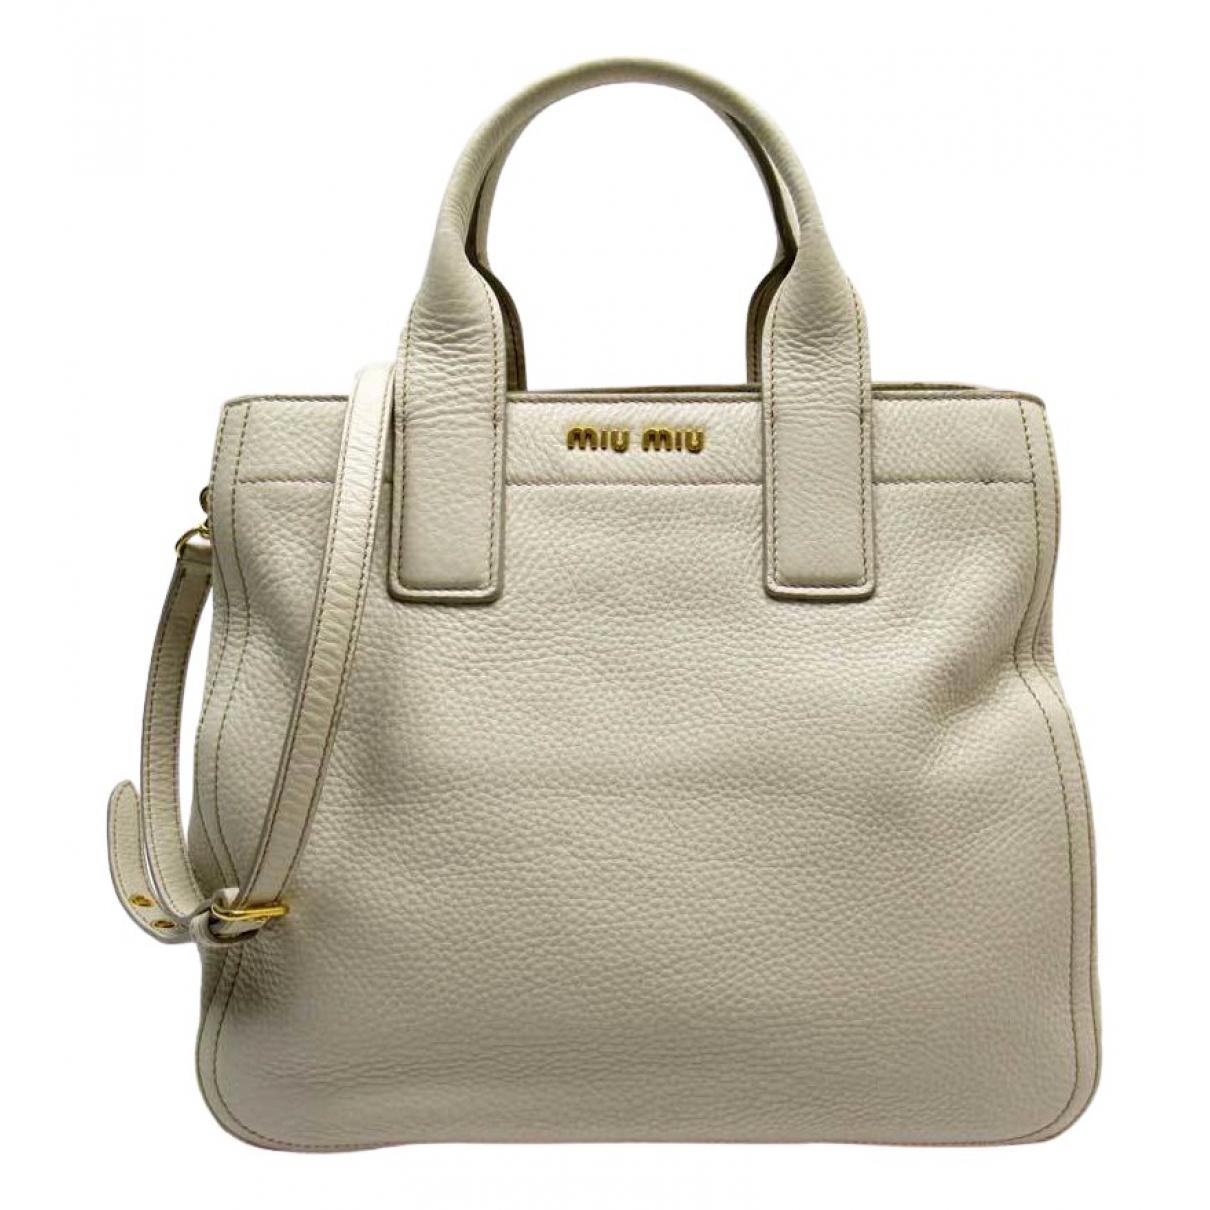 Miu Miu \N Ecru Leather handbag for Women \N